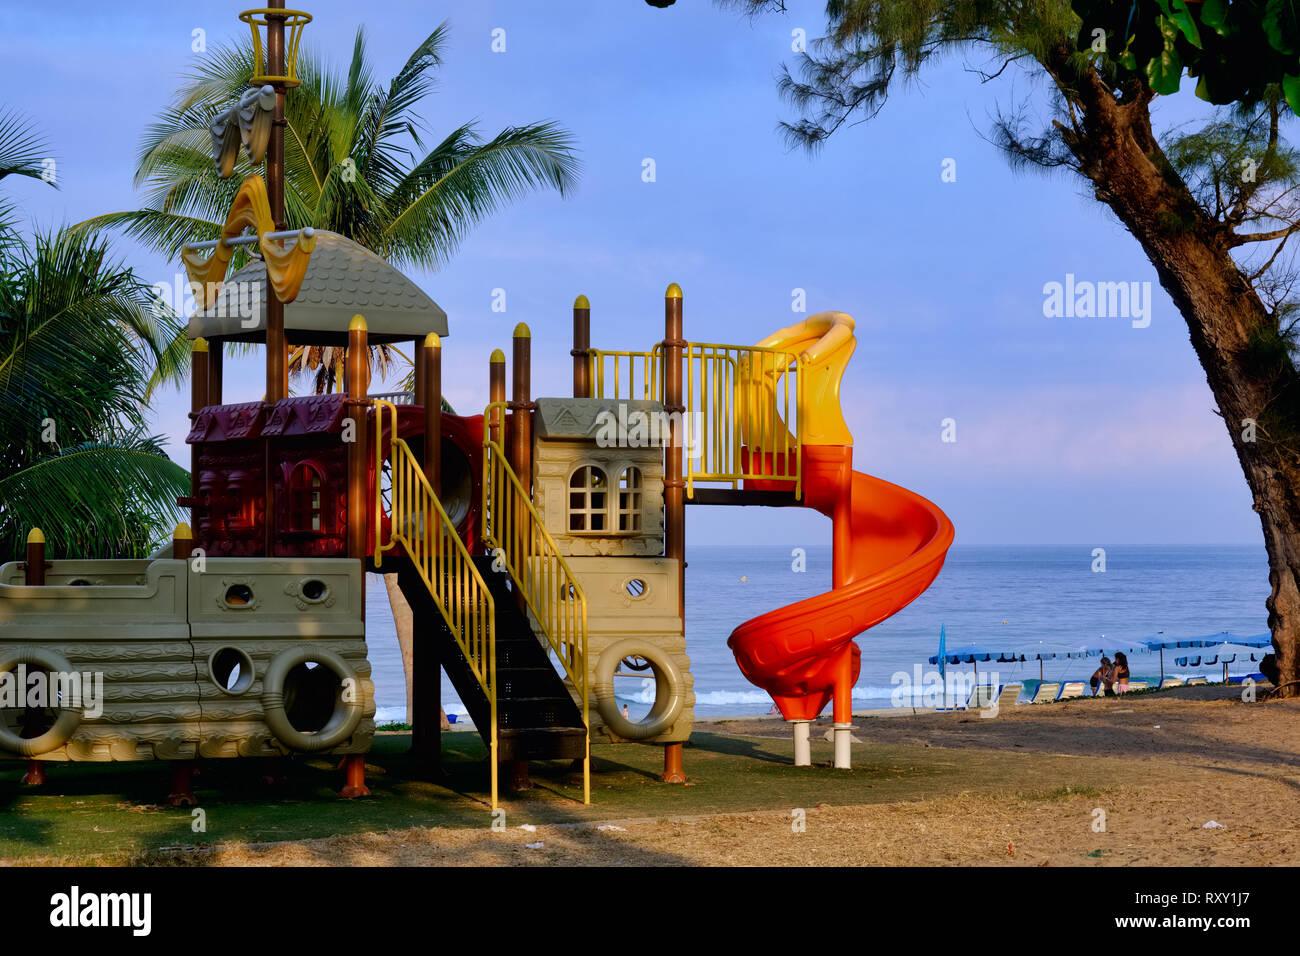 A children's playground at Karon Beach, Phuket, Thailand - Stock Image